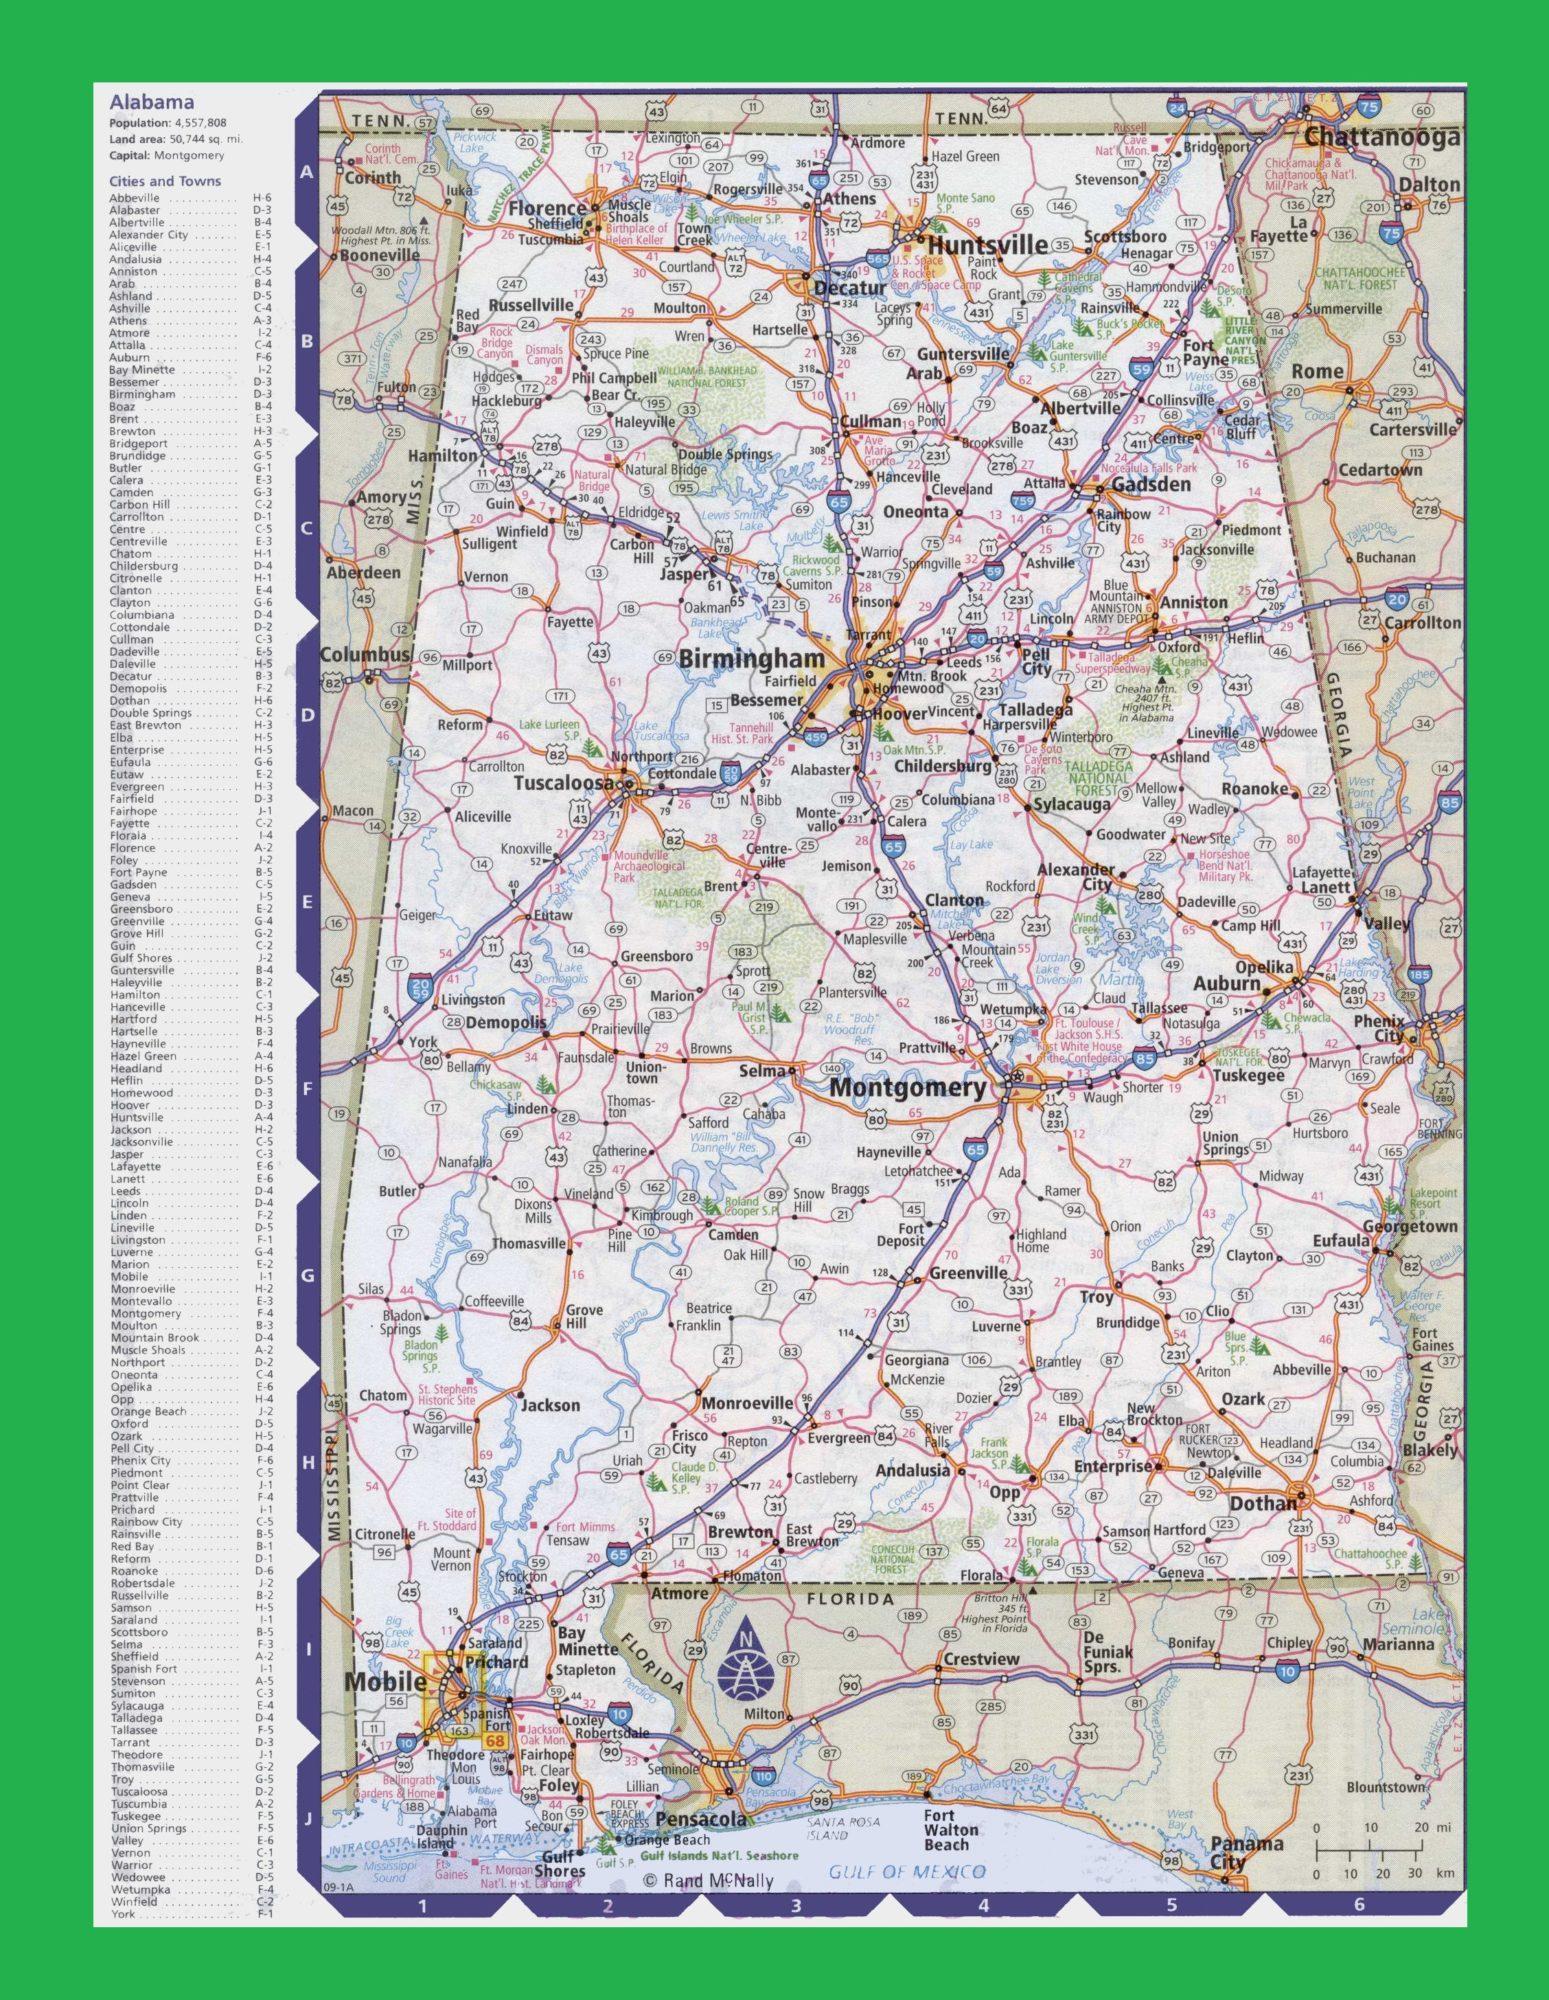 Alabama Large Political  Map   Political  Map of Alabama With Capital , city and River lake-2